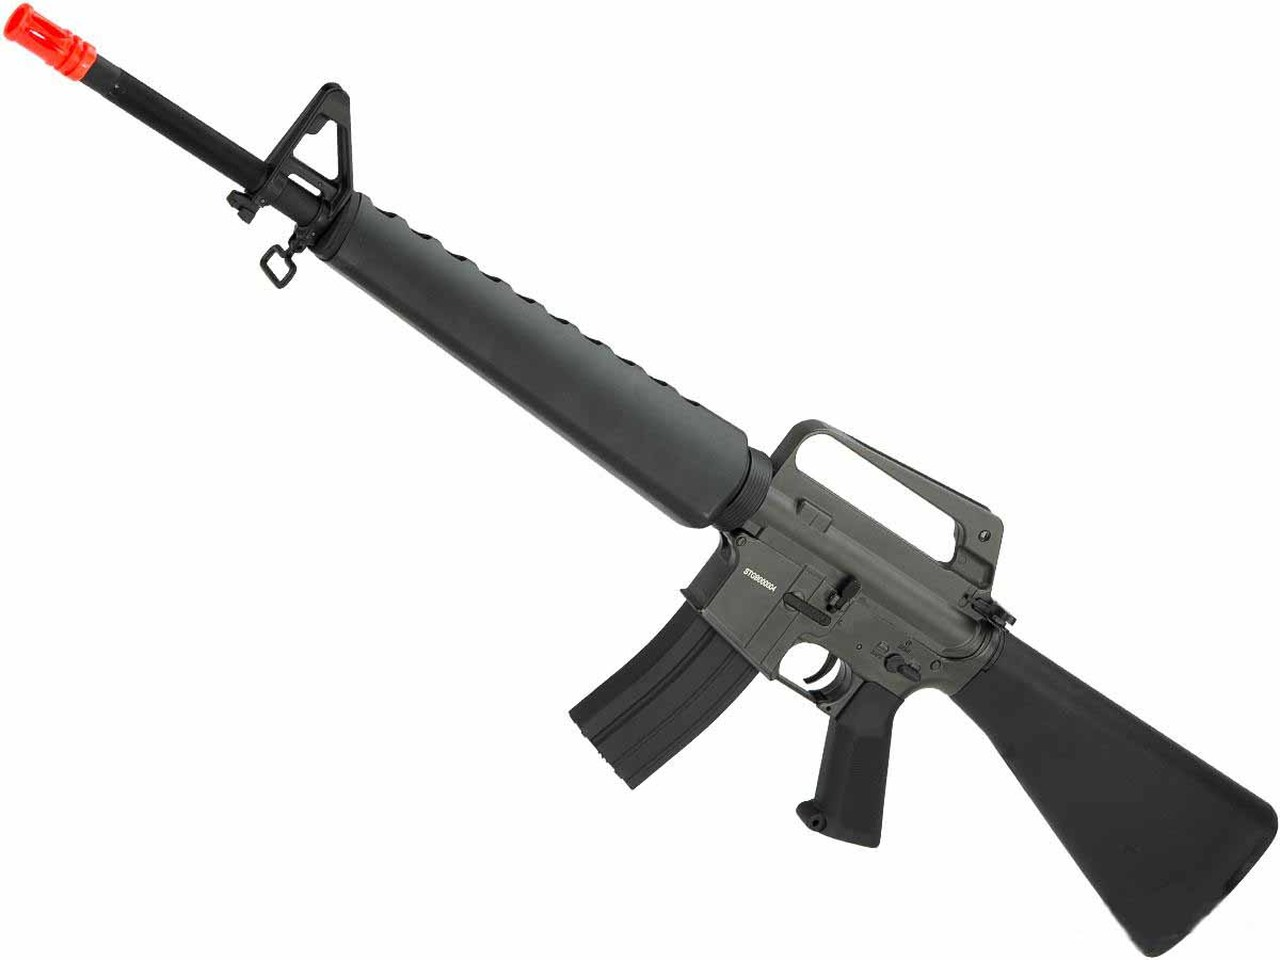 CYMA M16A1 / M16 Vietname Full Metal Airsoft AEG Rifle